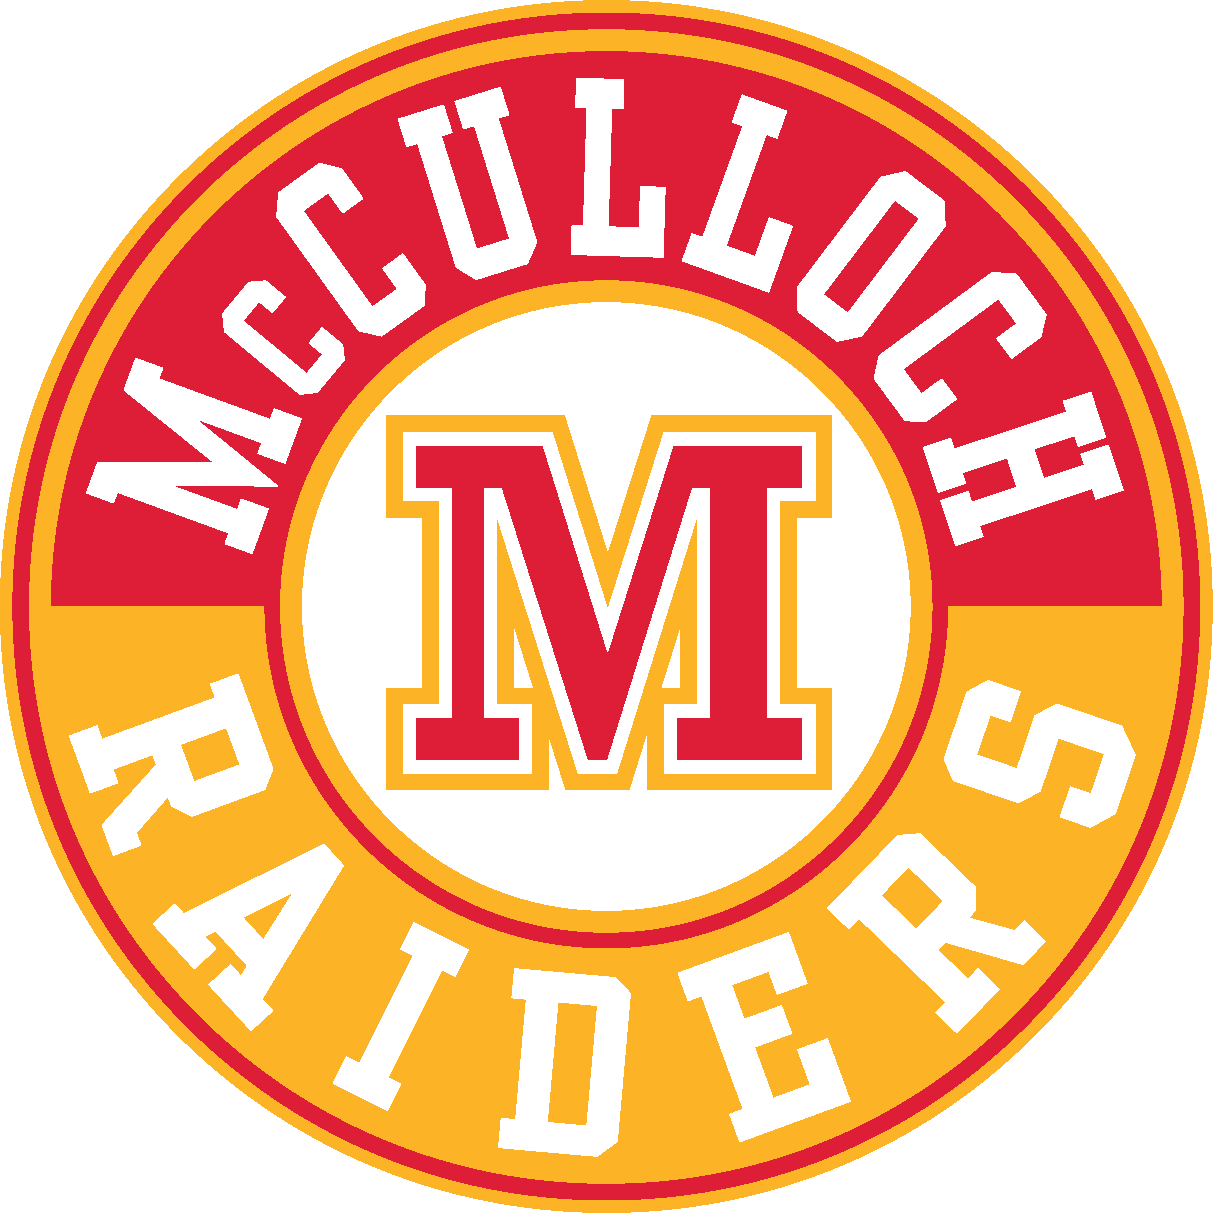 McCulloch Raiders letter crest logo